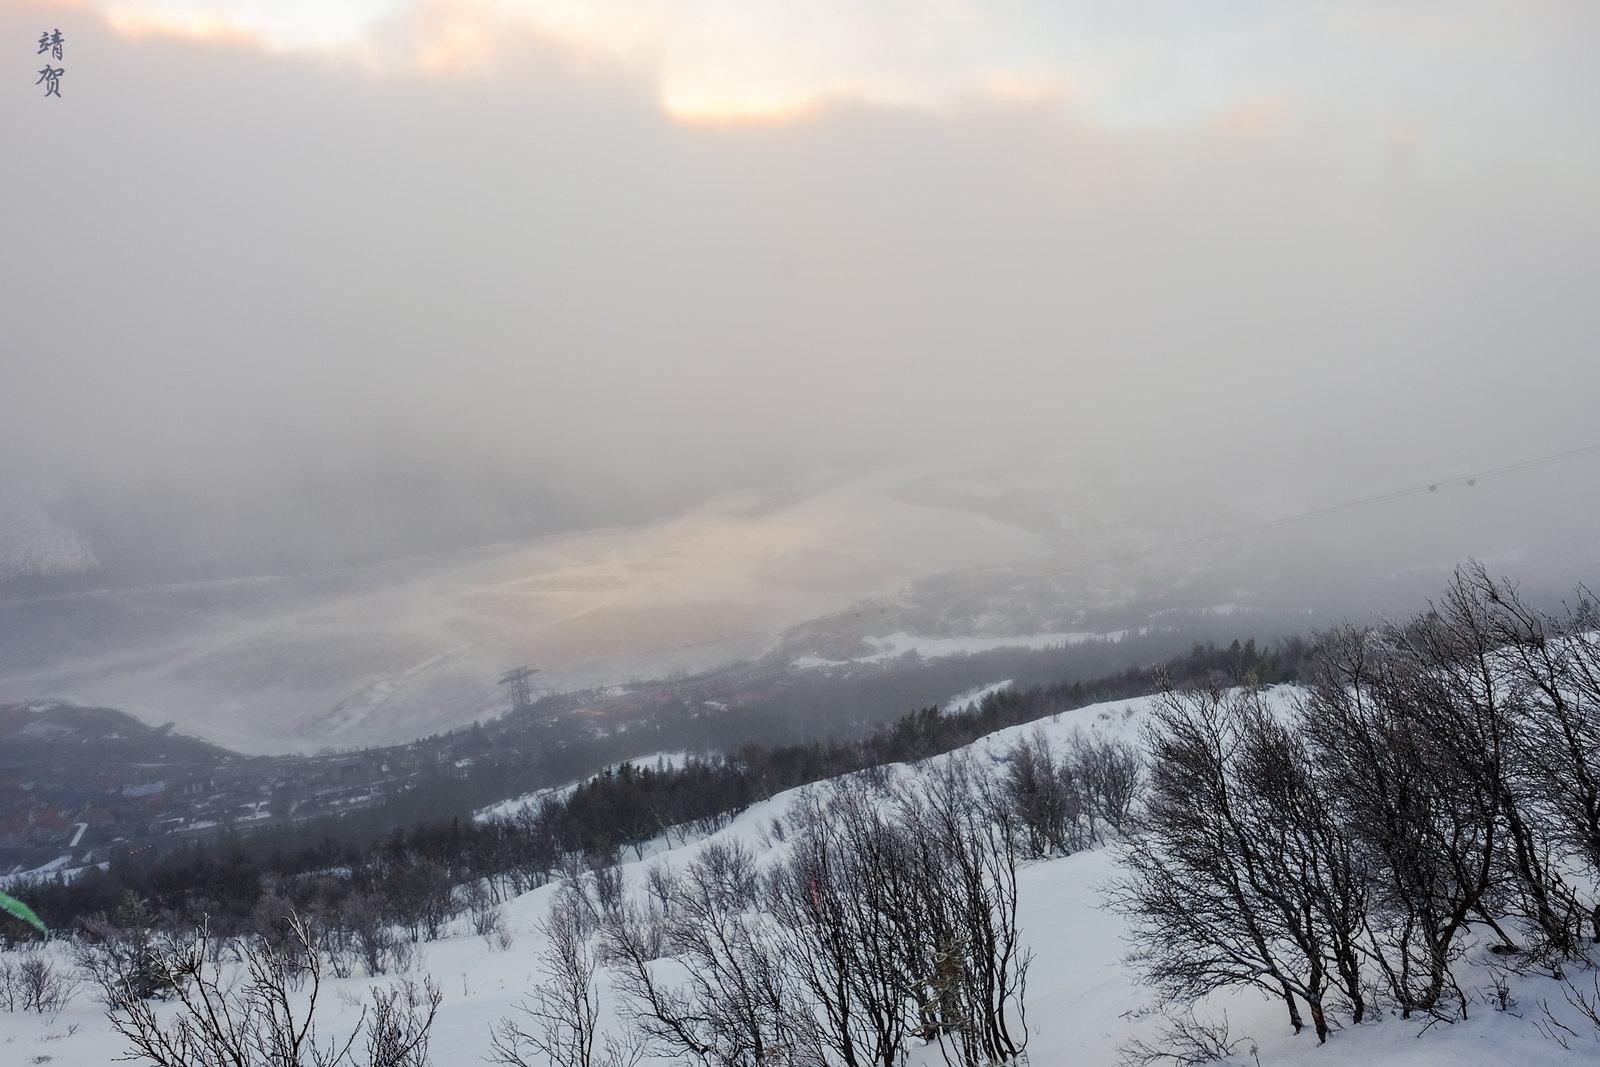 Summit view from Åreskutan